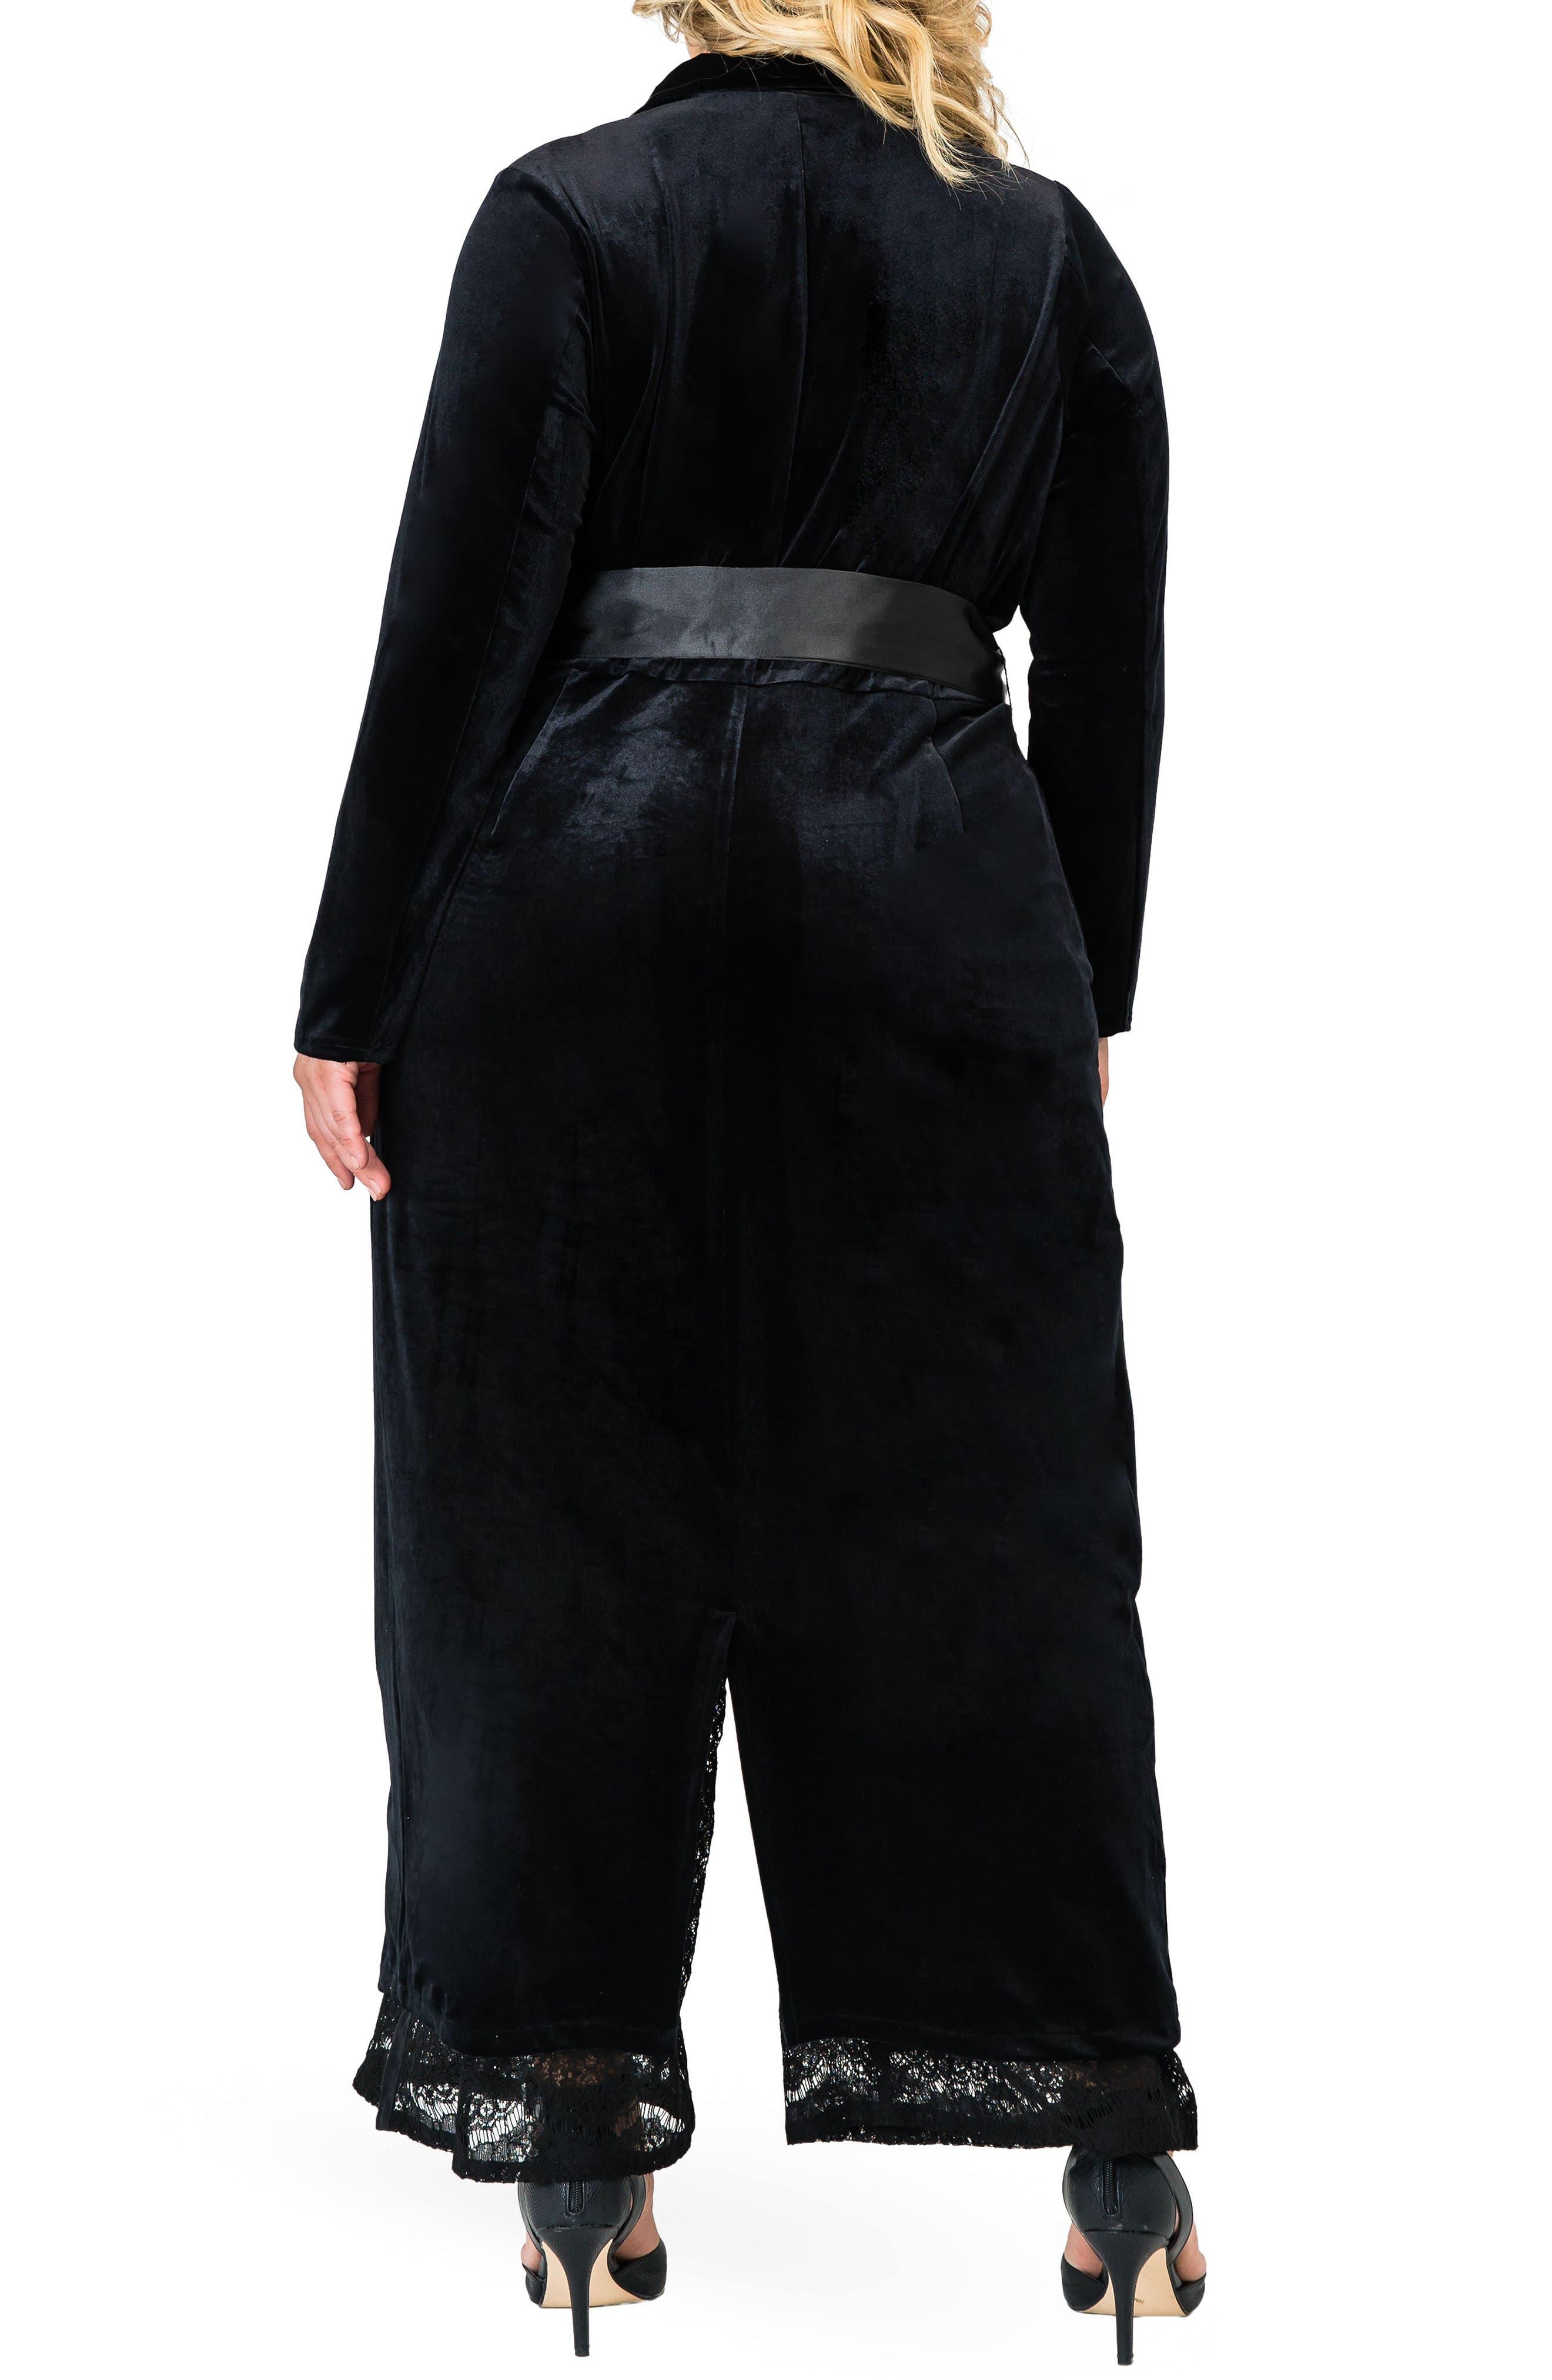 STANDARDS & PRACTICES,                             Freya Wrap Coat Dress,                             Alternate thumbnail 2, color,                             BLACK